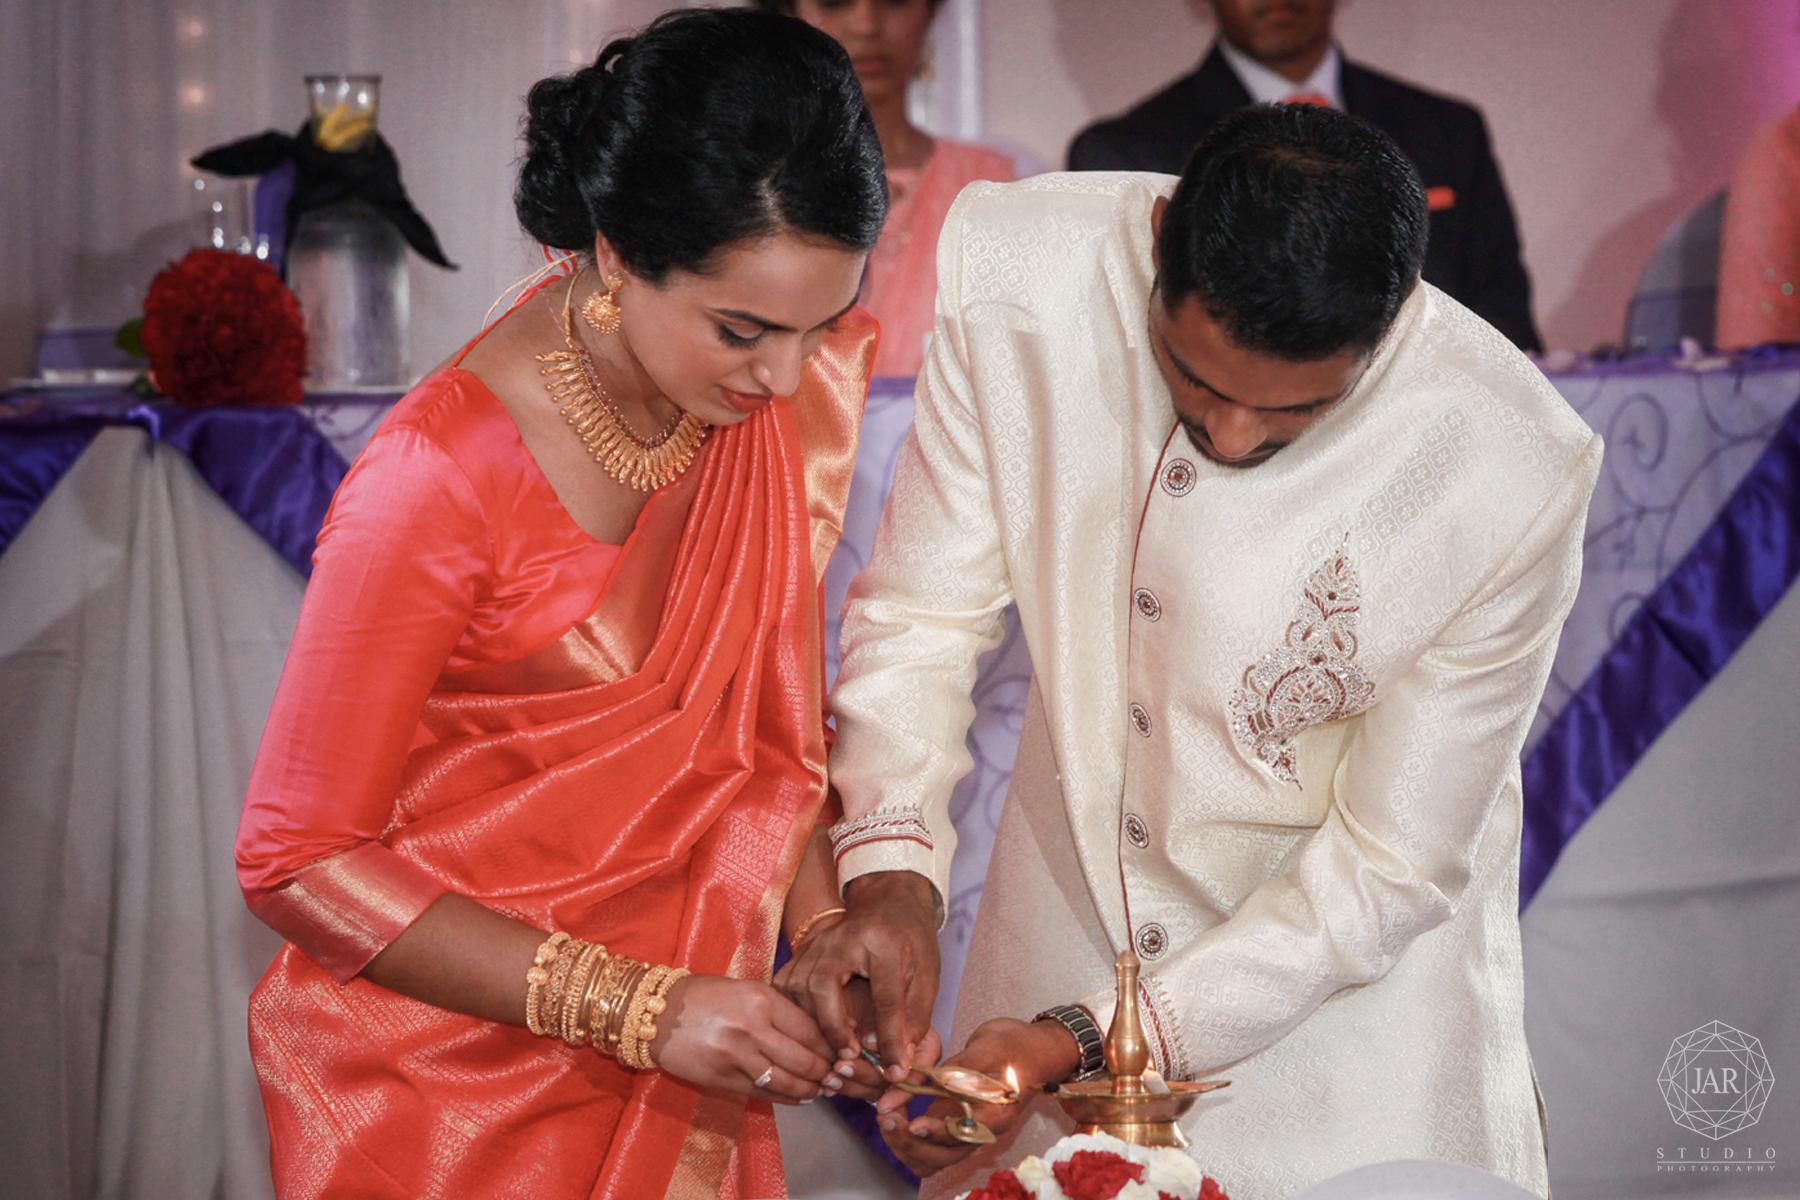 34-lamp-reception-tradition-indian-wedding-florida-photographer.jpg